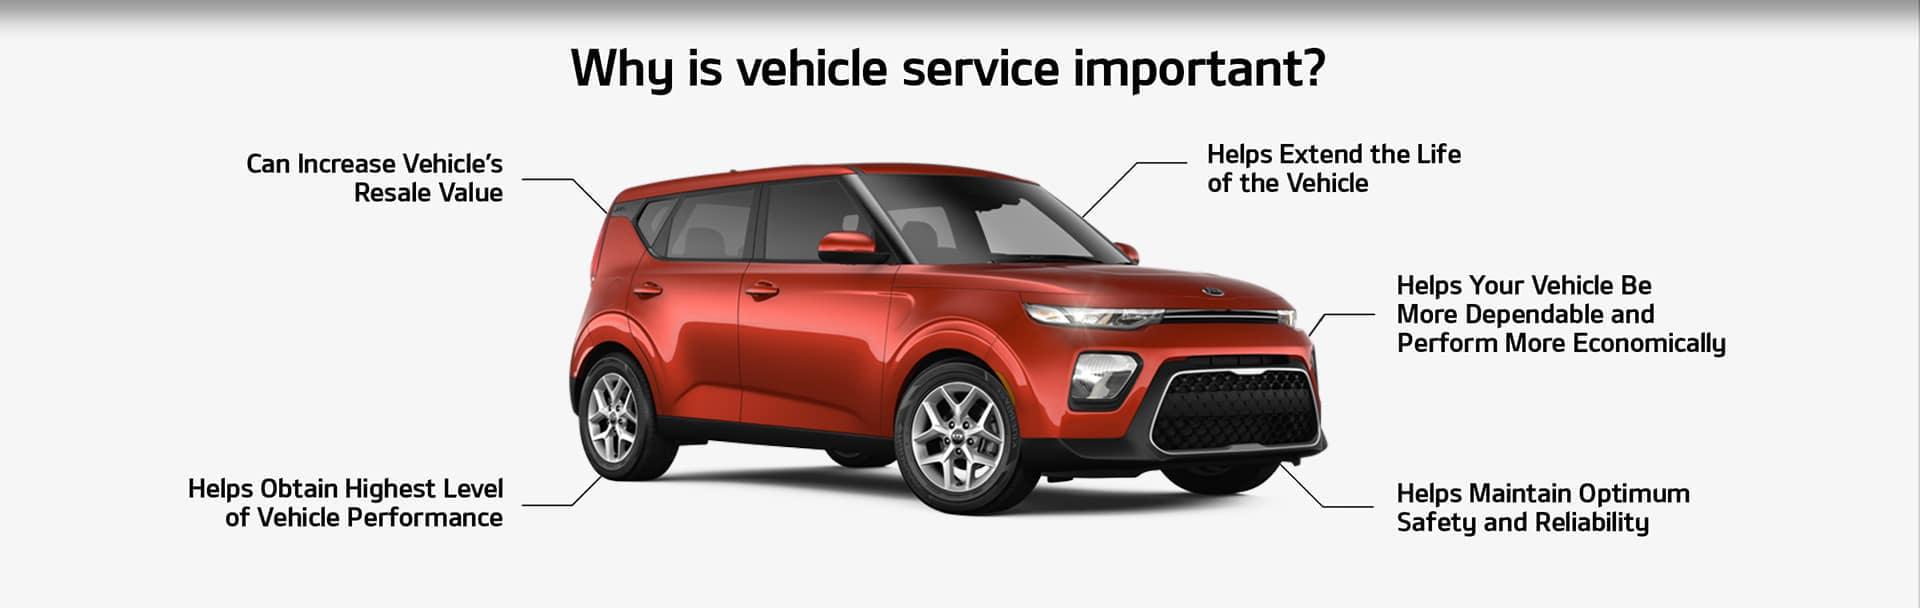 Kia Service is Important